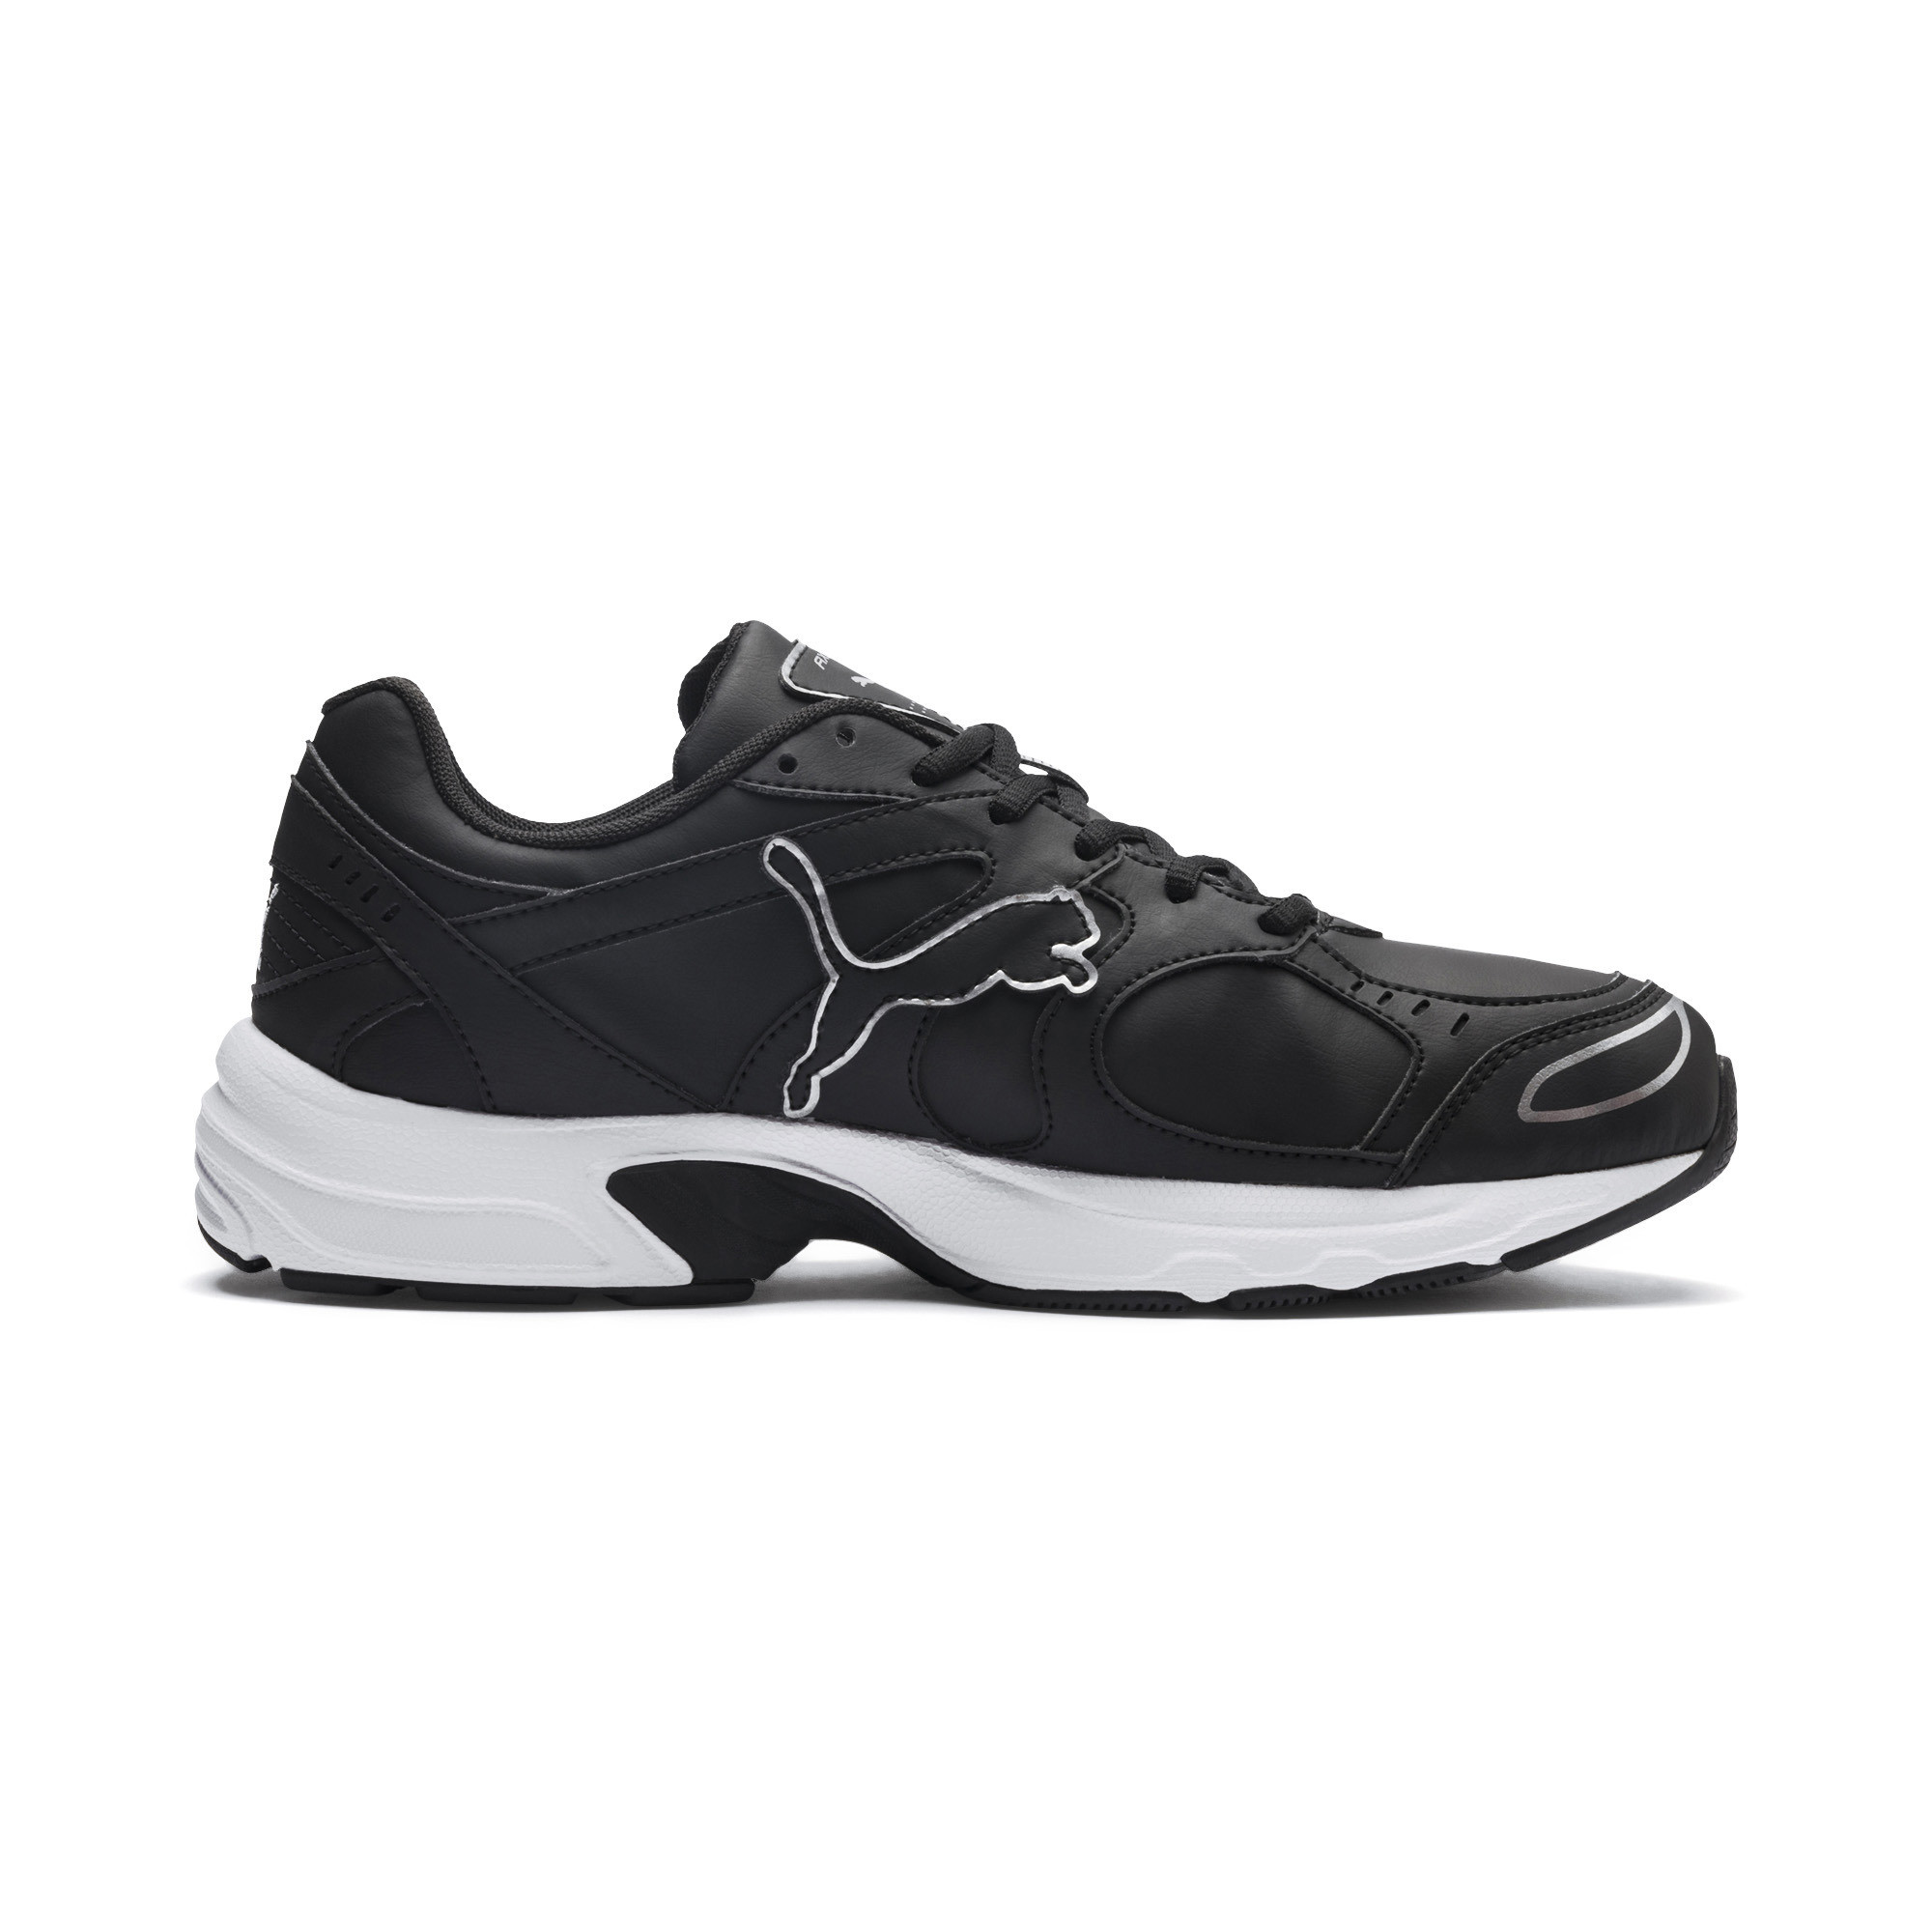 PUMA-Men-039-s-Axis-SL-Sneakers thumbnail 12